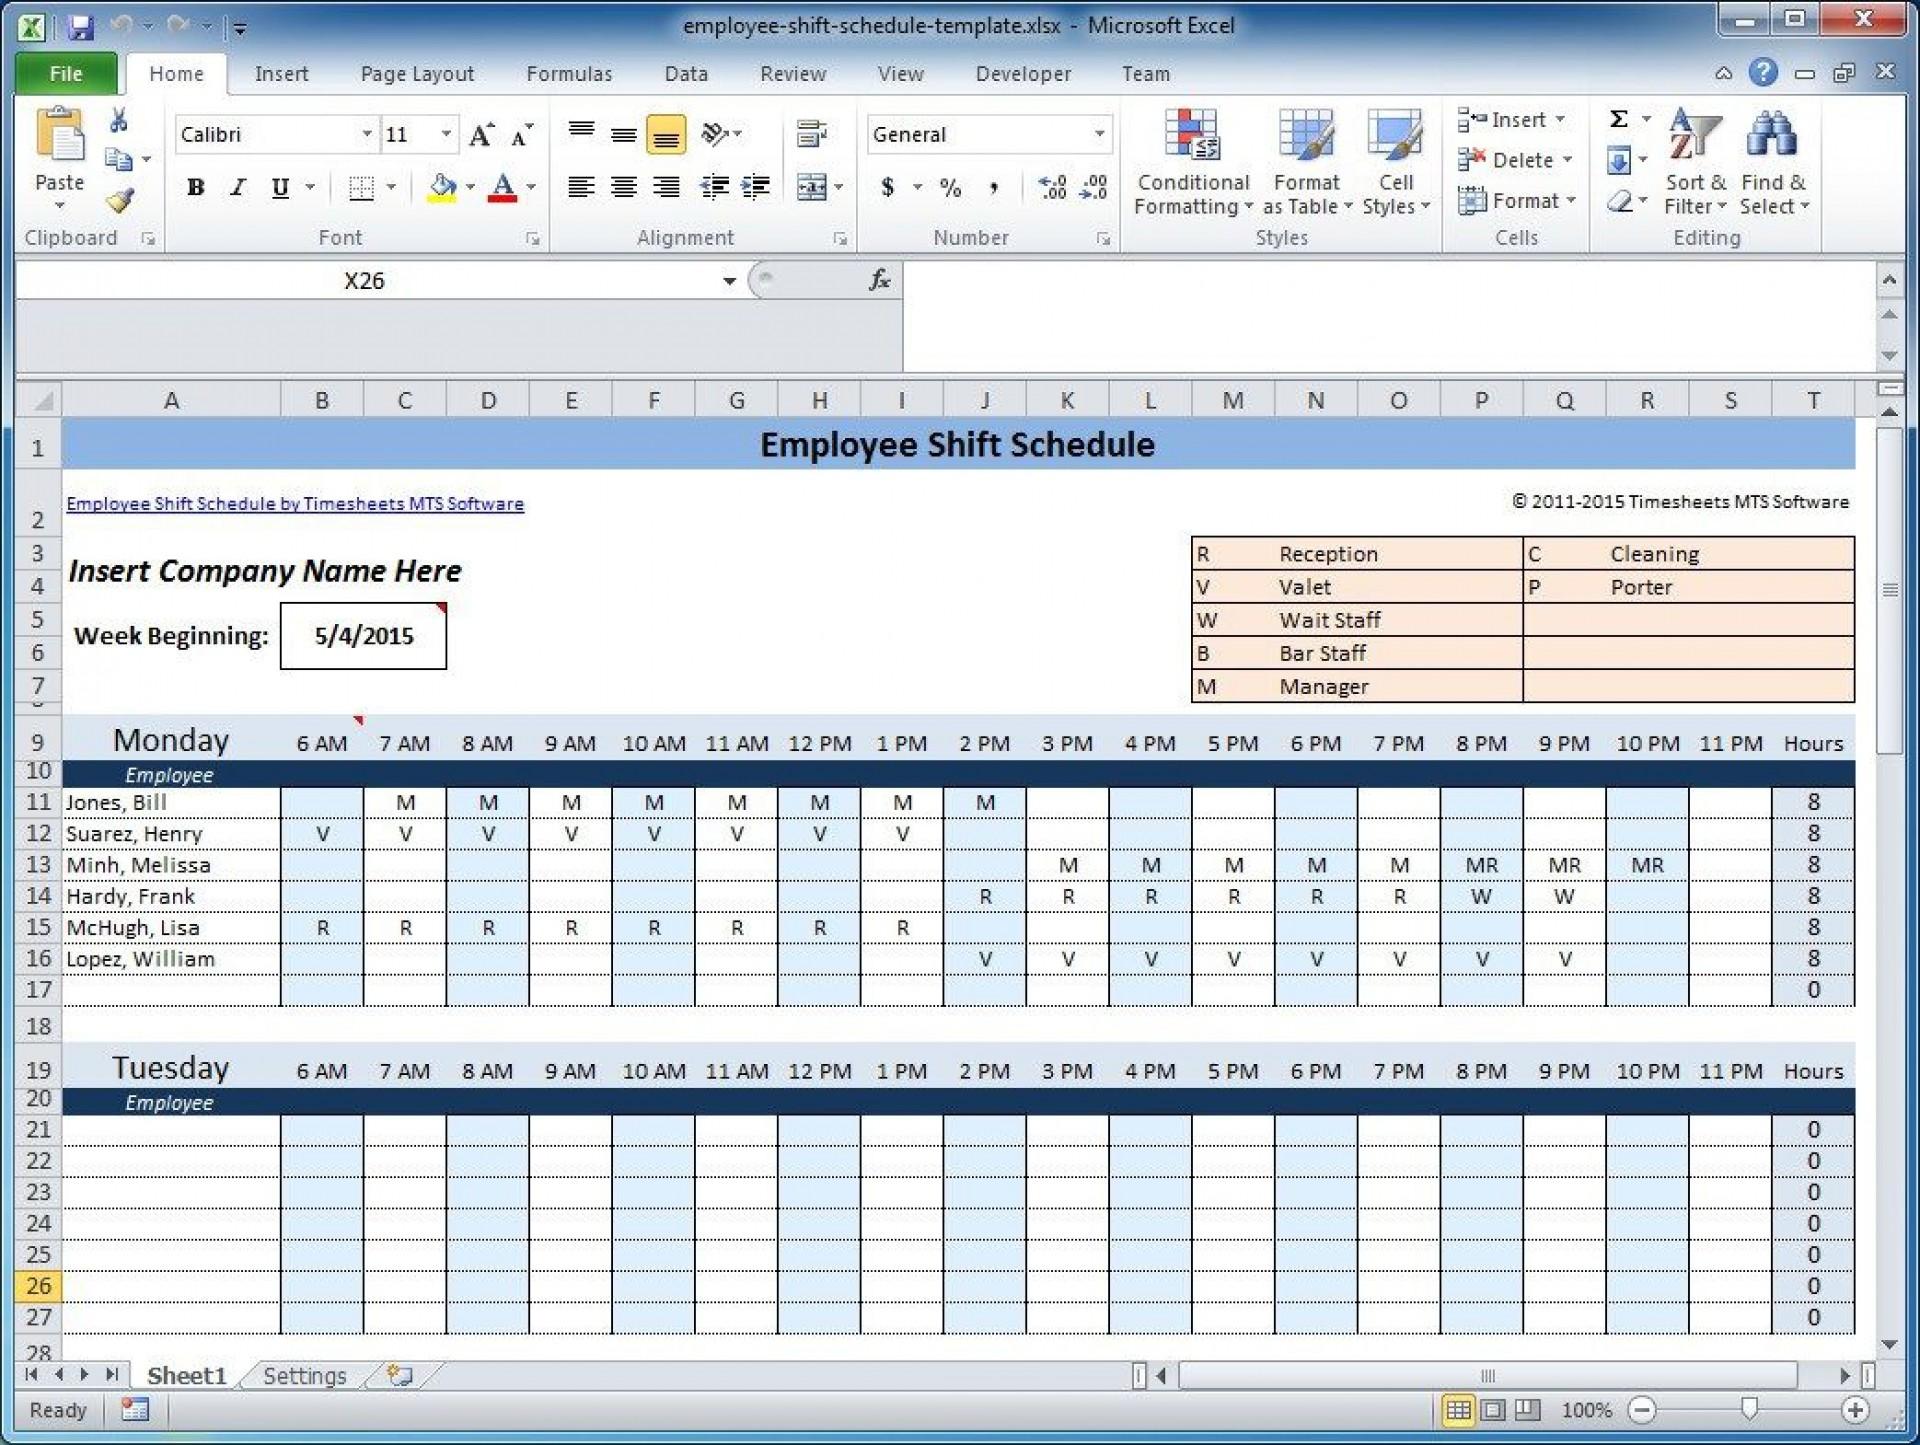 007 Imposing Employee Shift Scheduling Template Image  Schedule Google Sheet Work Plan Word Weekly Excel Free1920